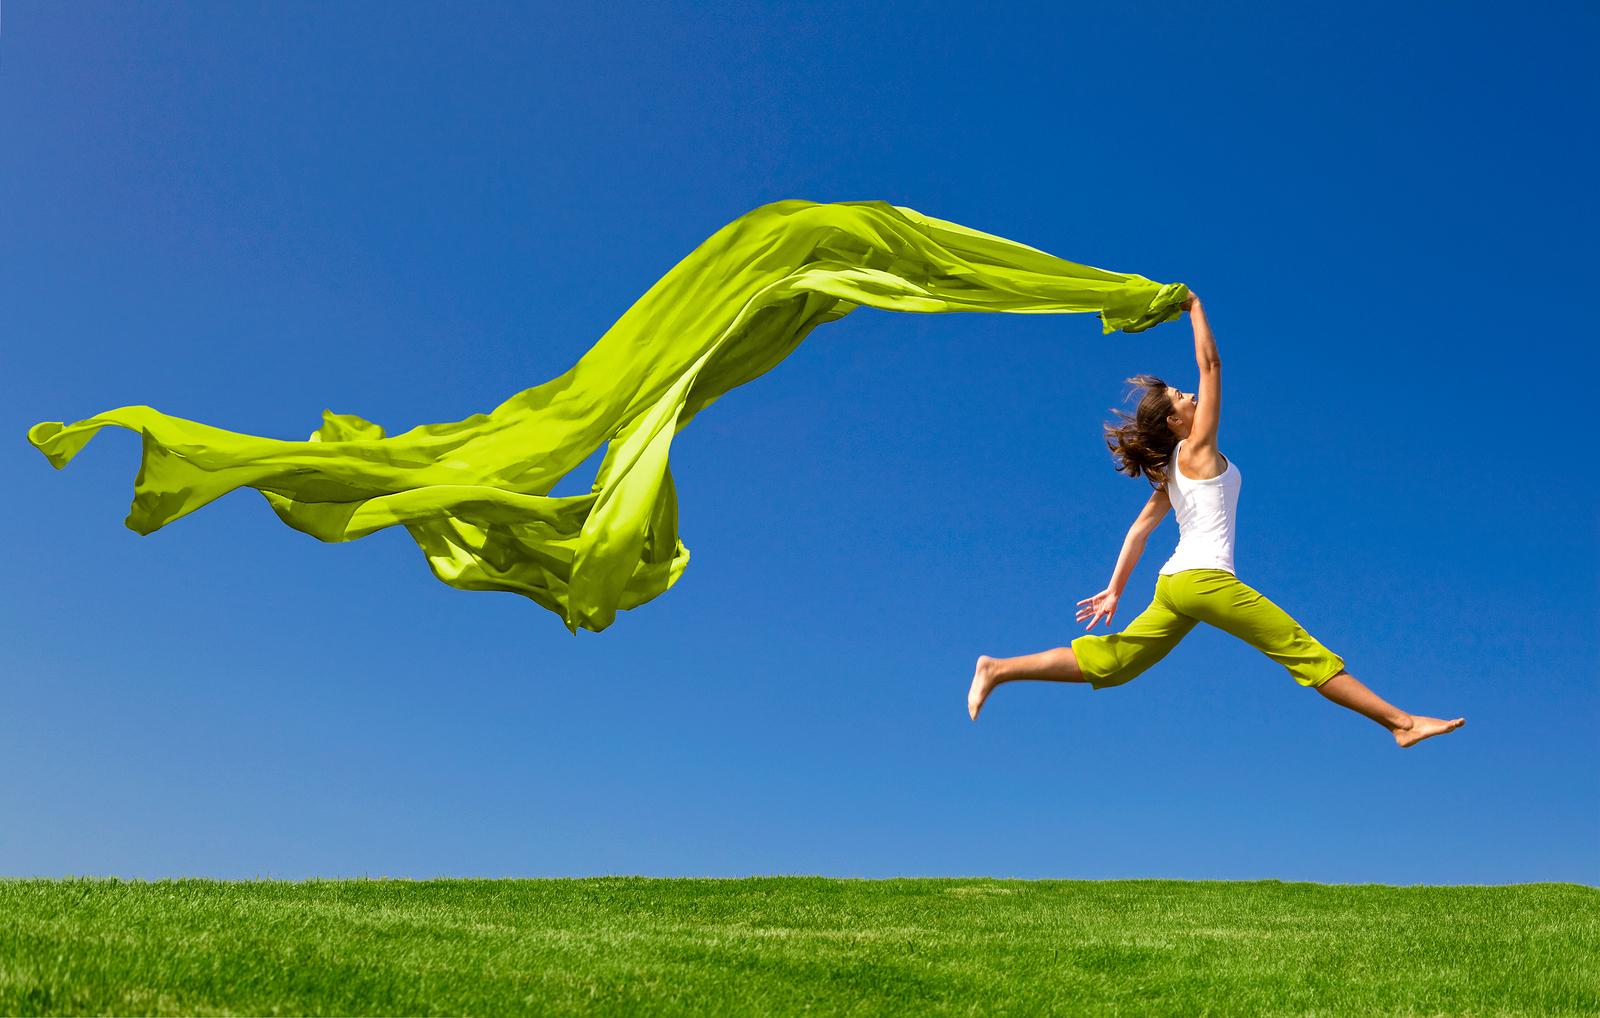 Women Jumping in Sunny Grass